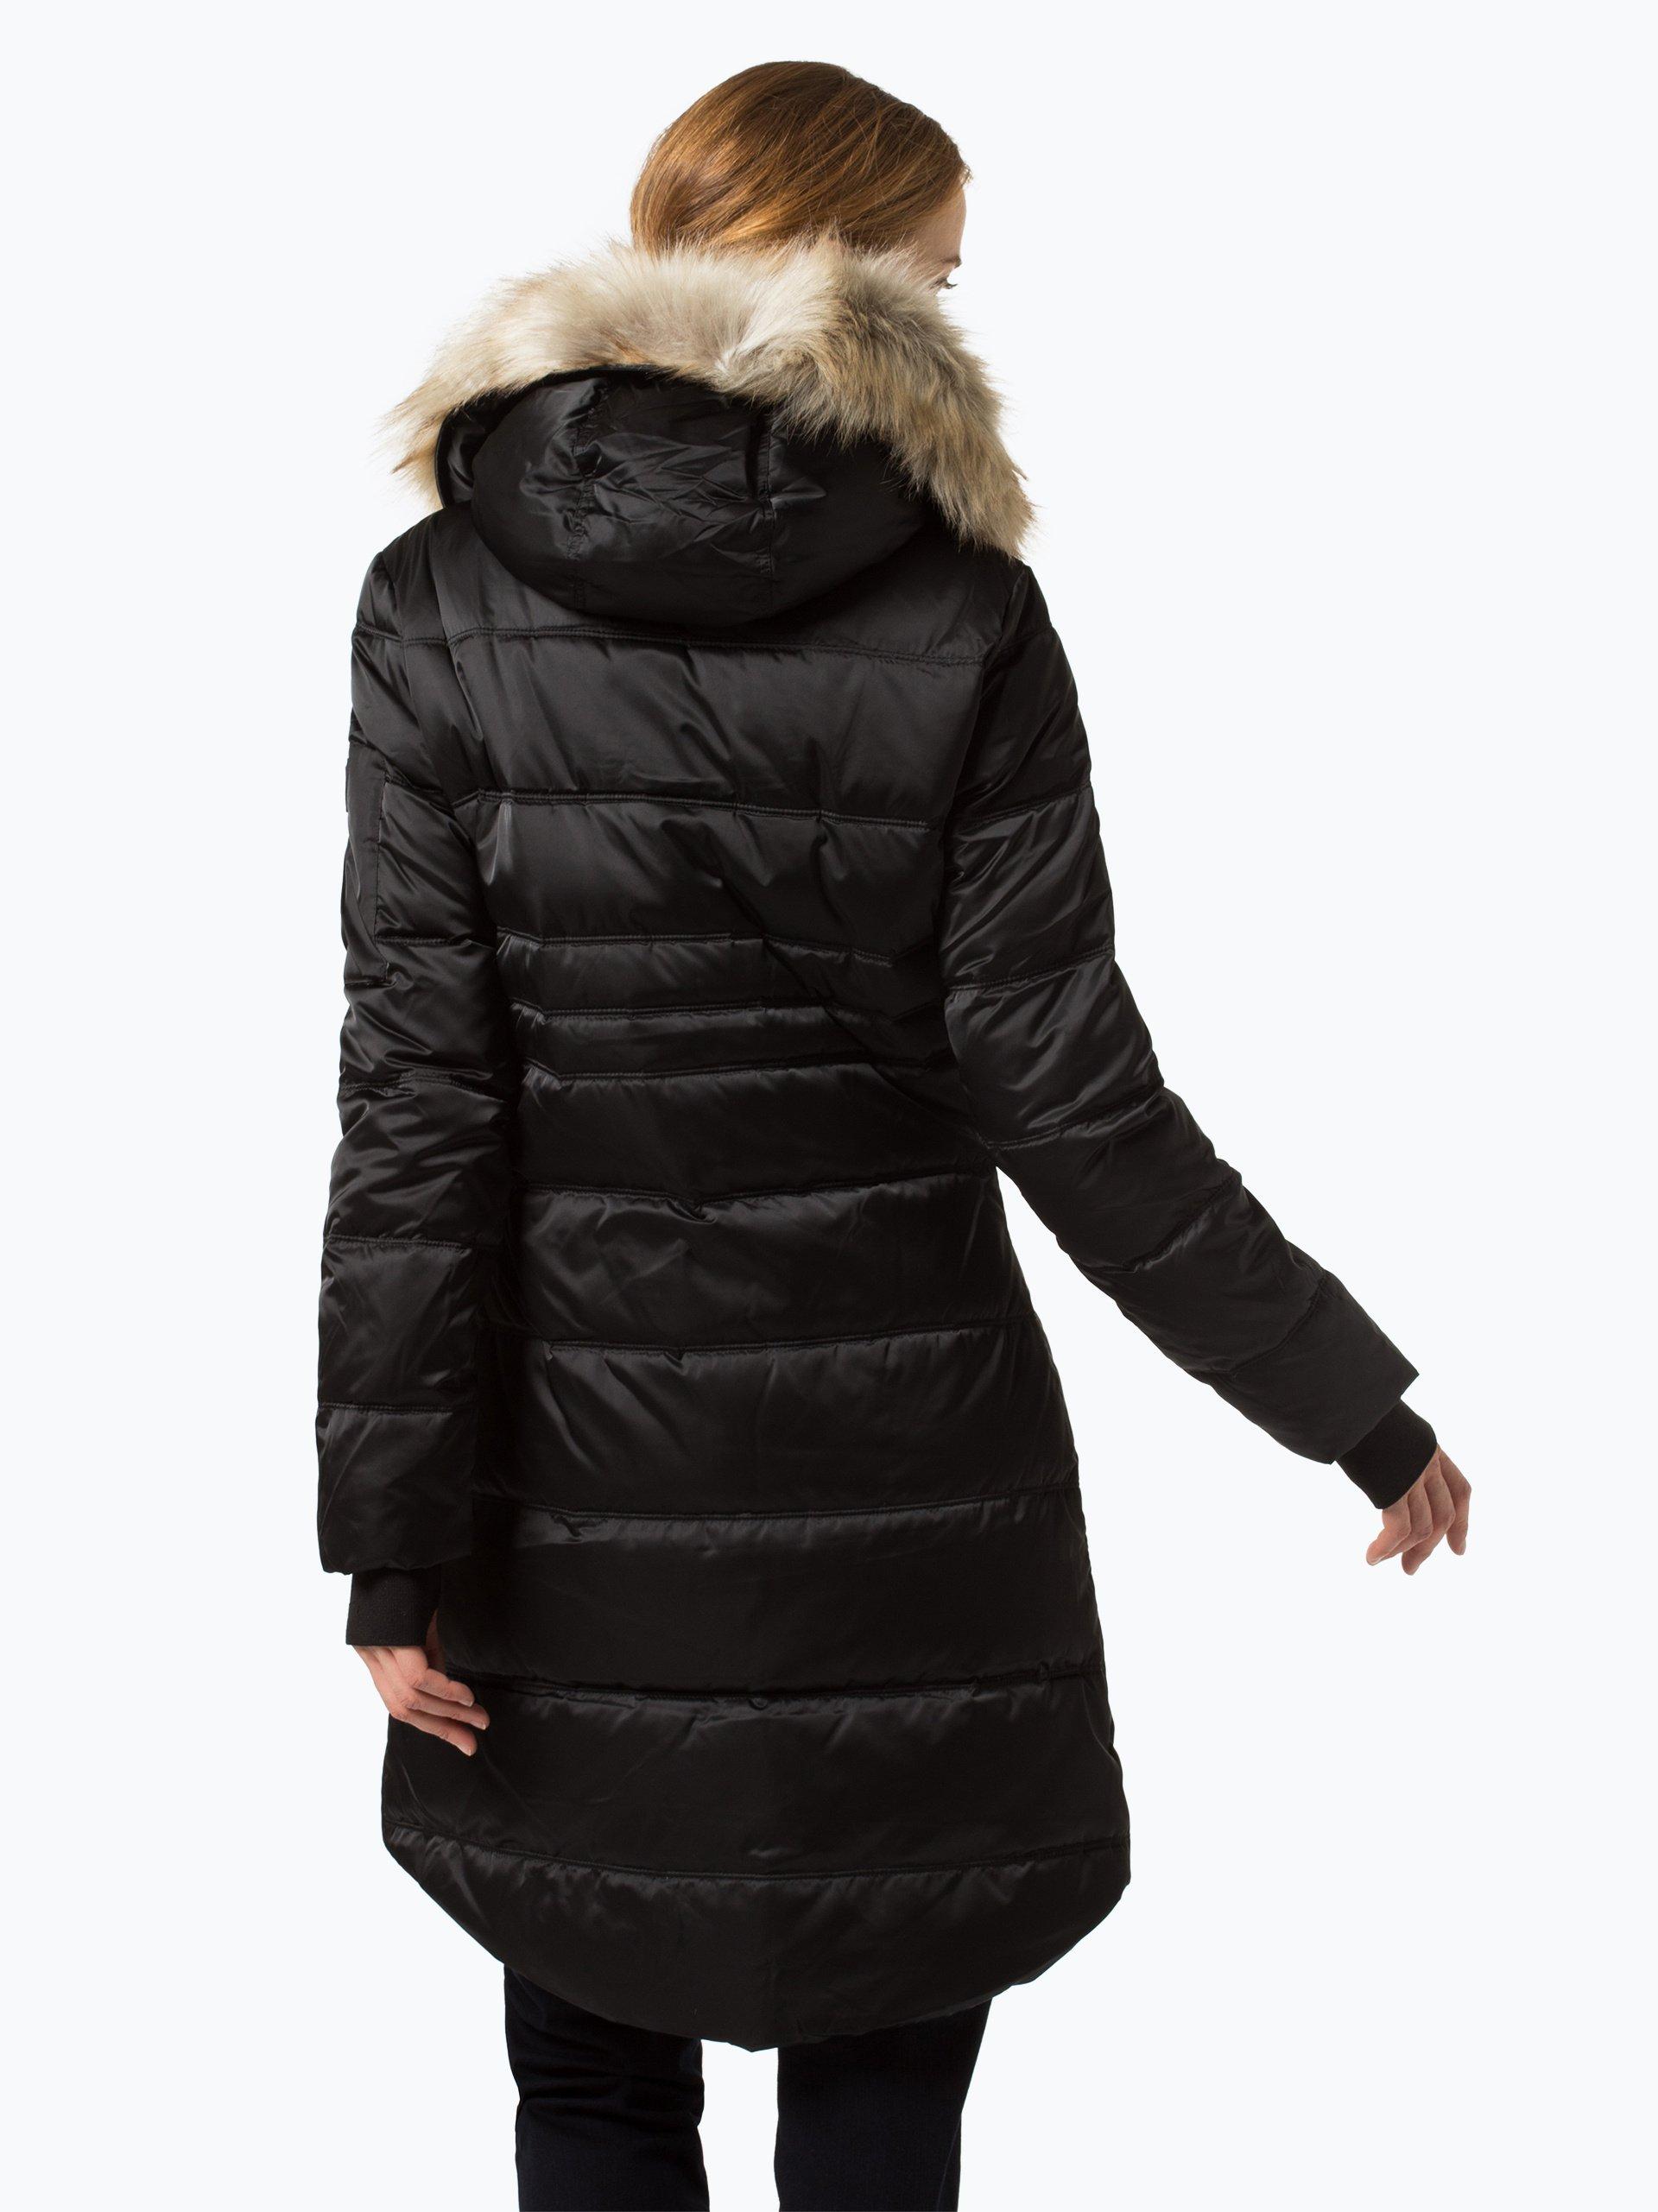 Klein Calvin KaufenVangraaf Jeans com Damen Online Daunenmantel 3AR5jqL4